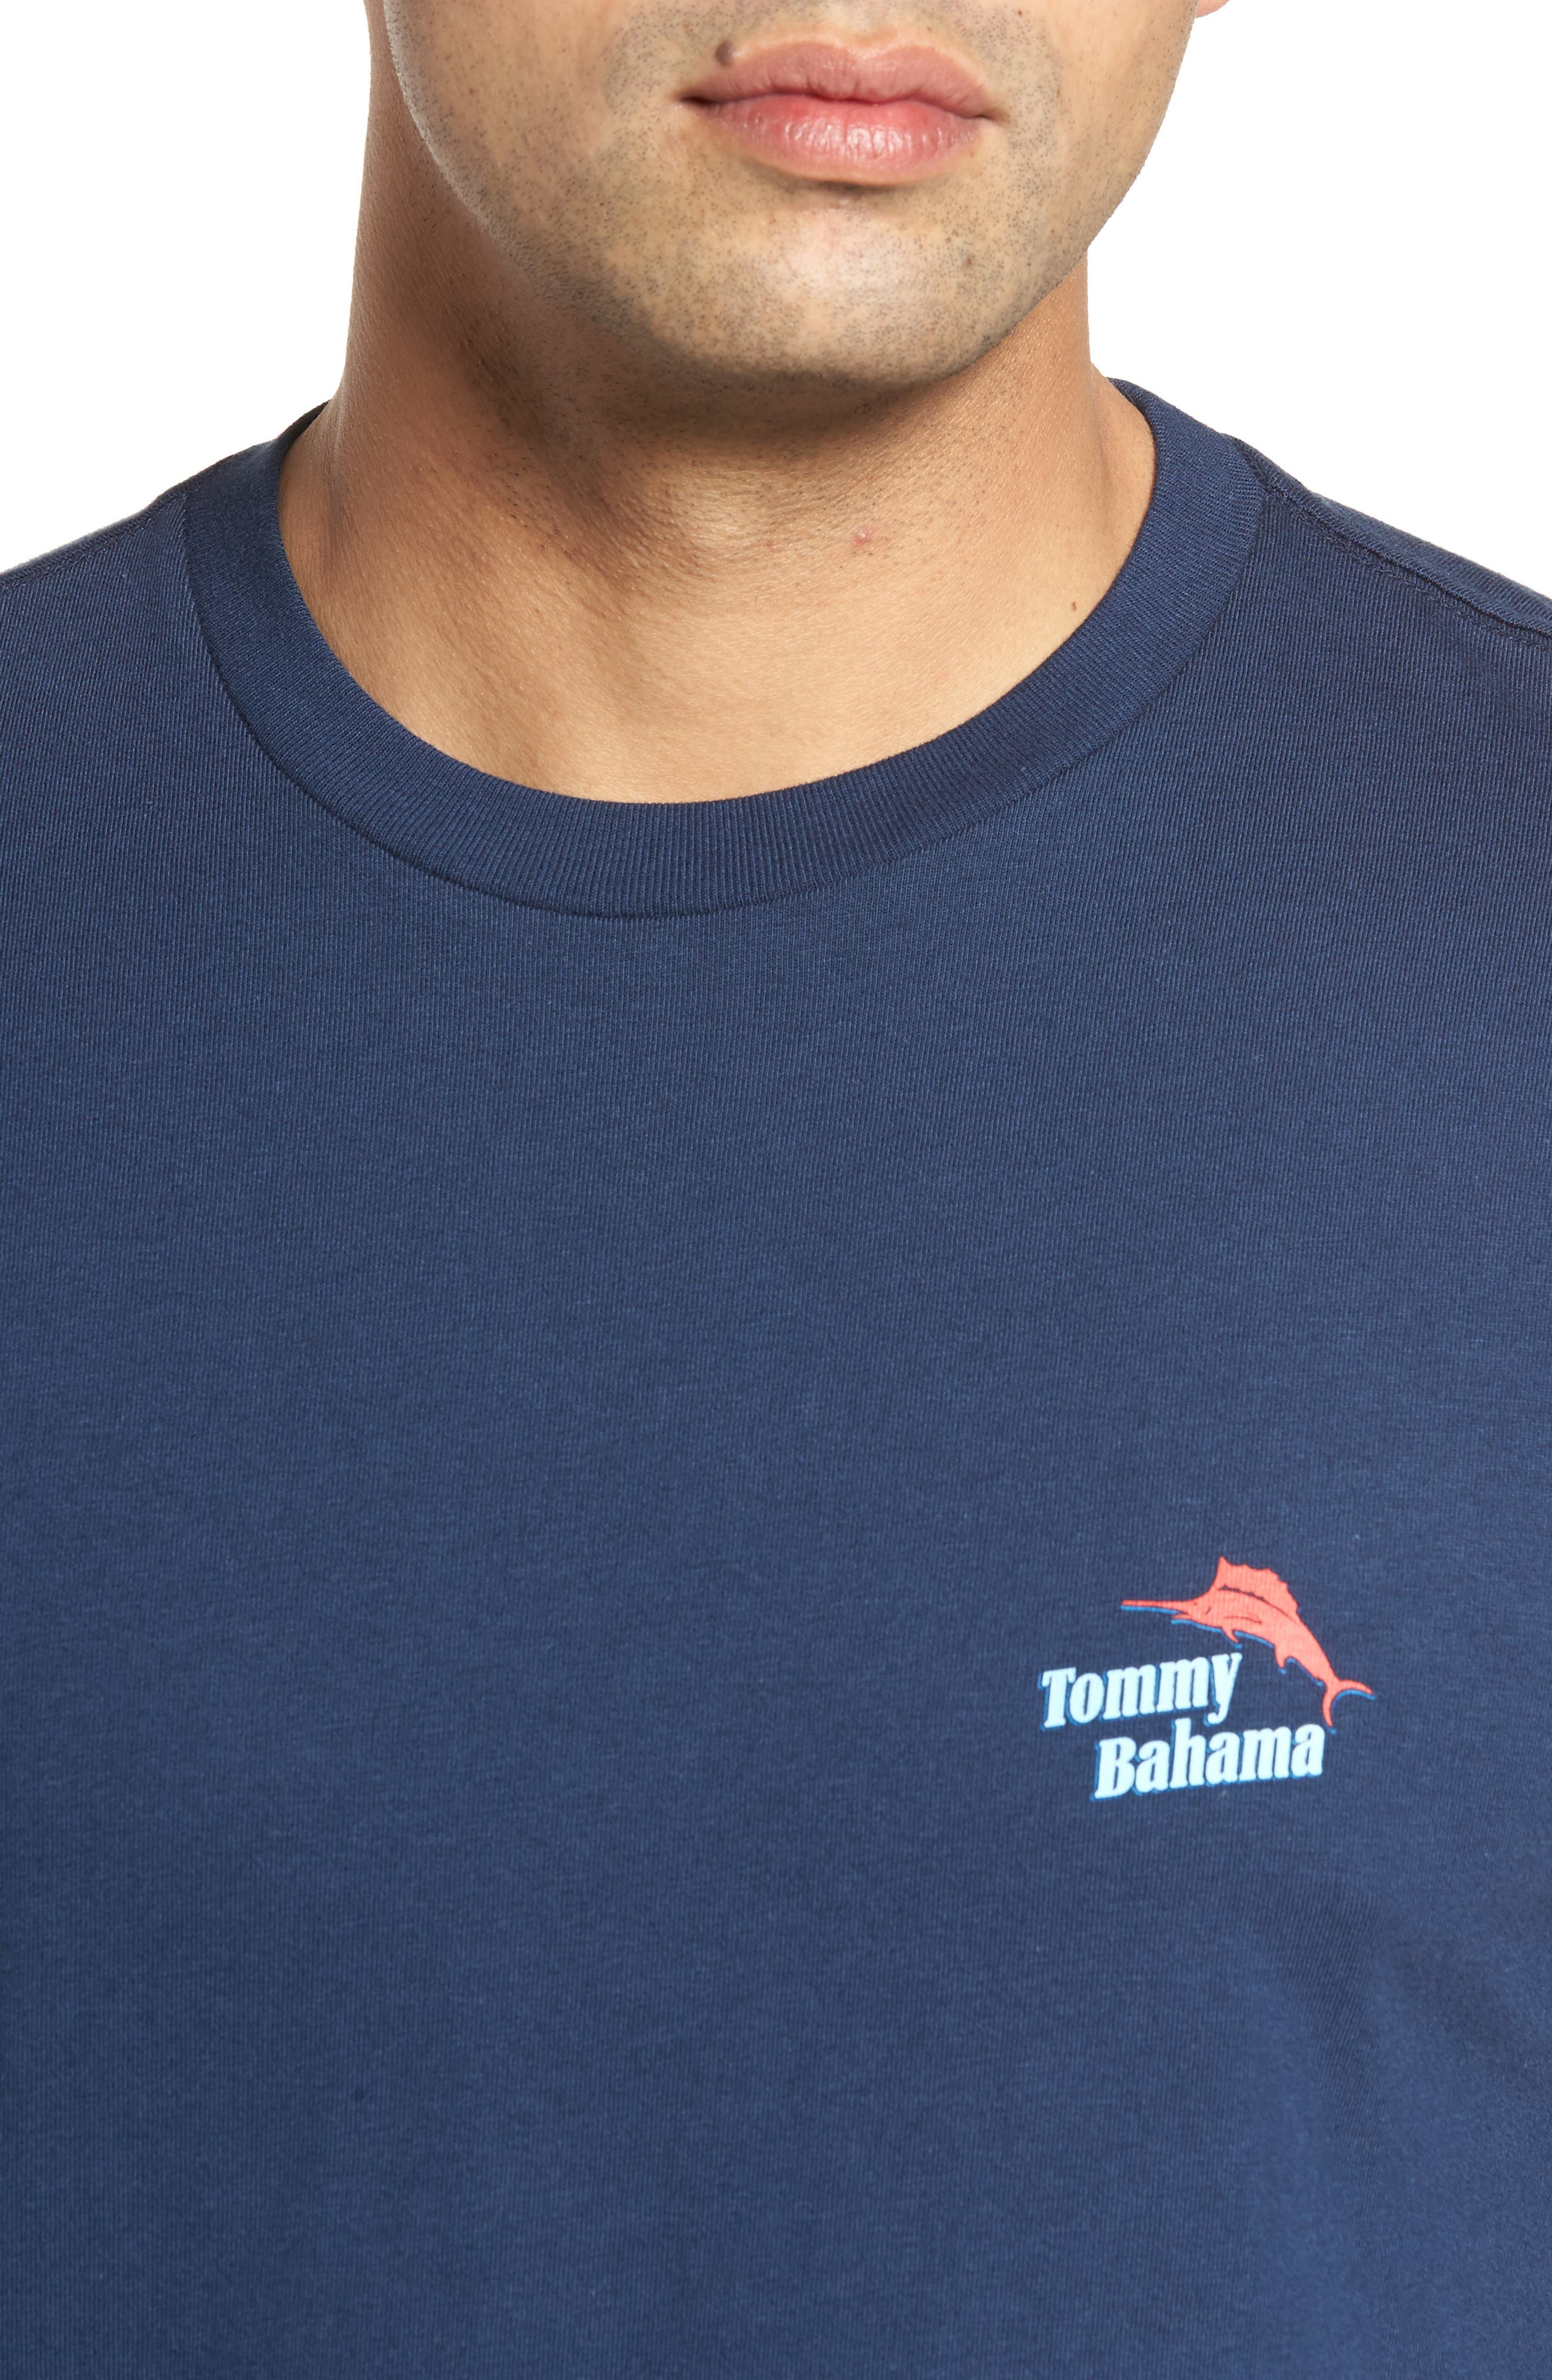 Parrot Sailing T-Shirt,                             Alternate thumbnail 4, color,                             400